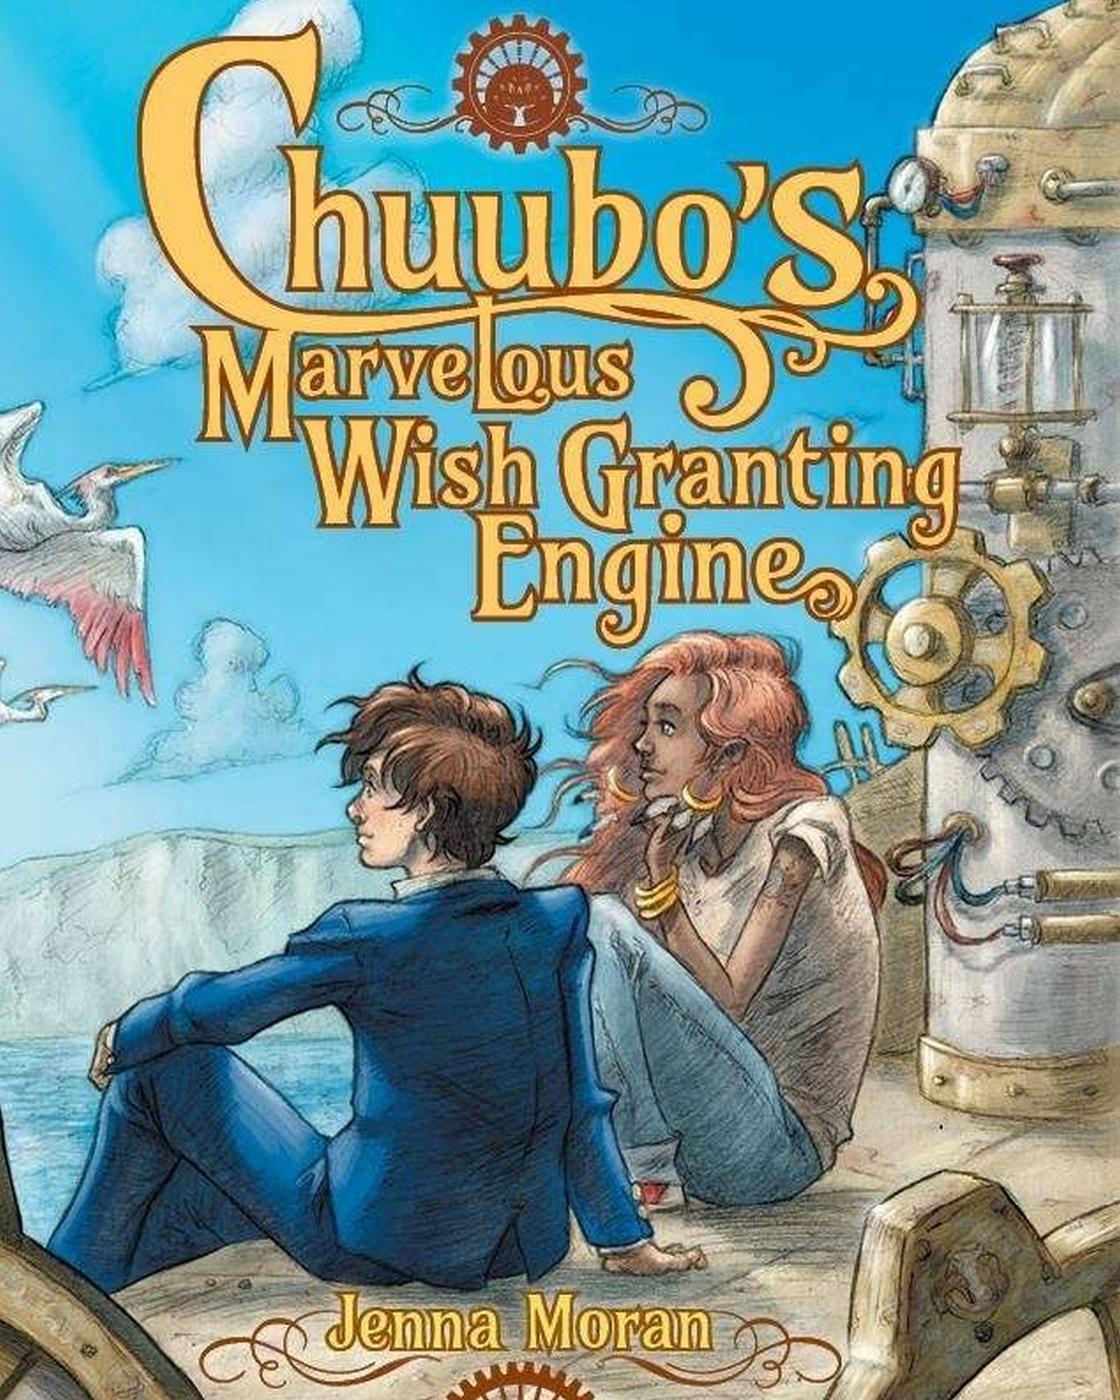 Resized Chuubo Cover